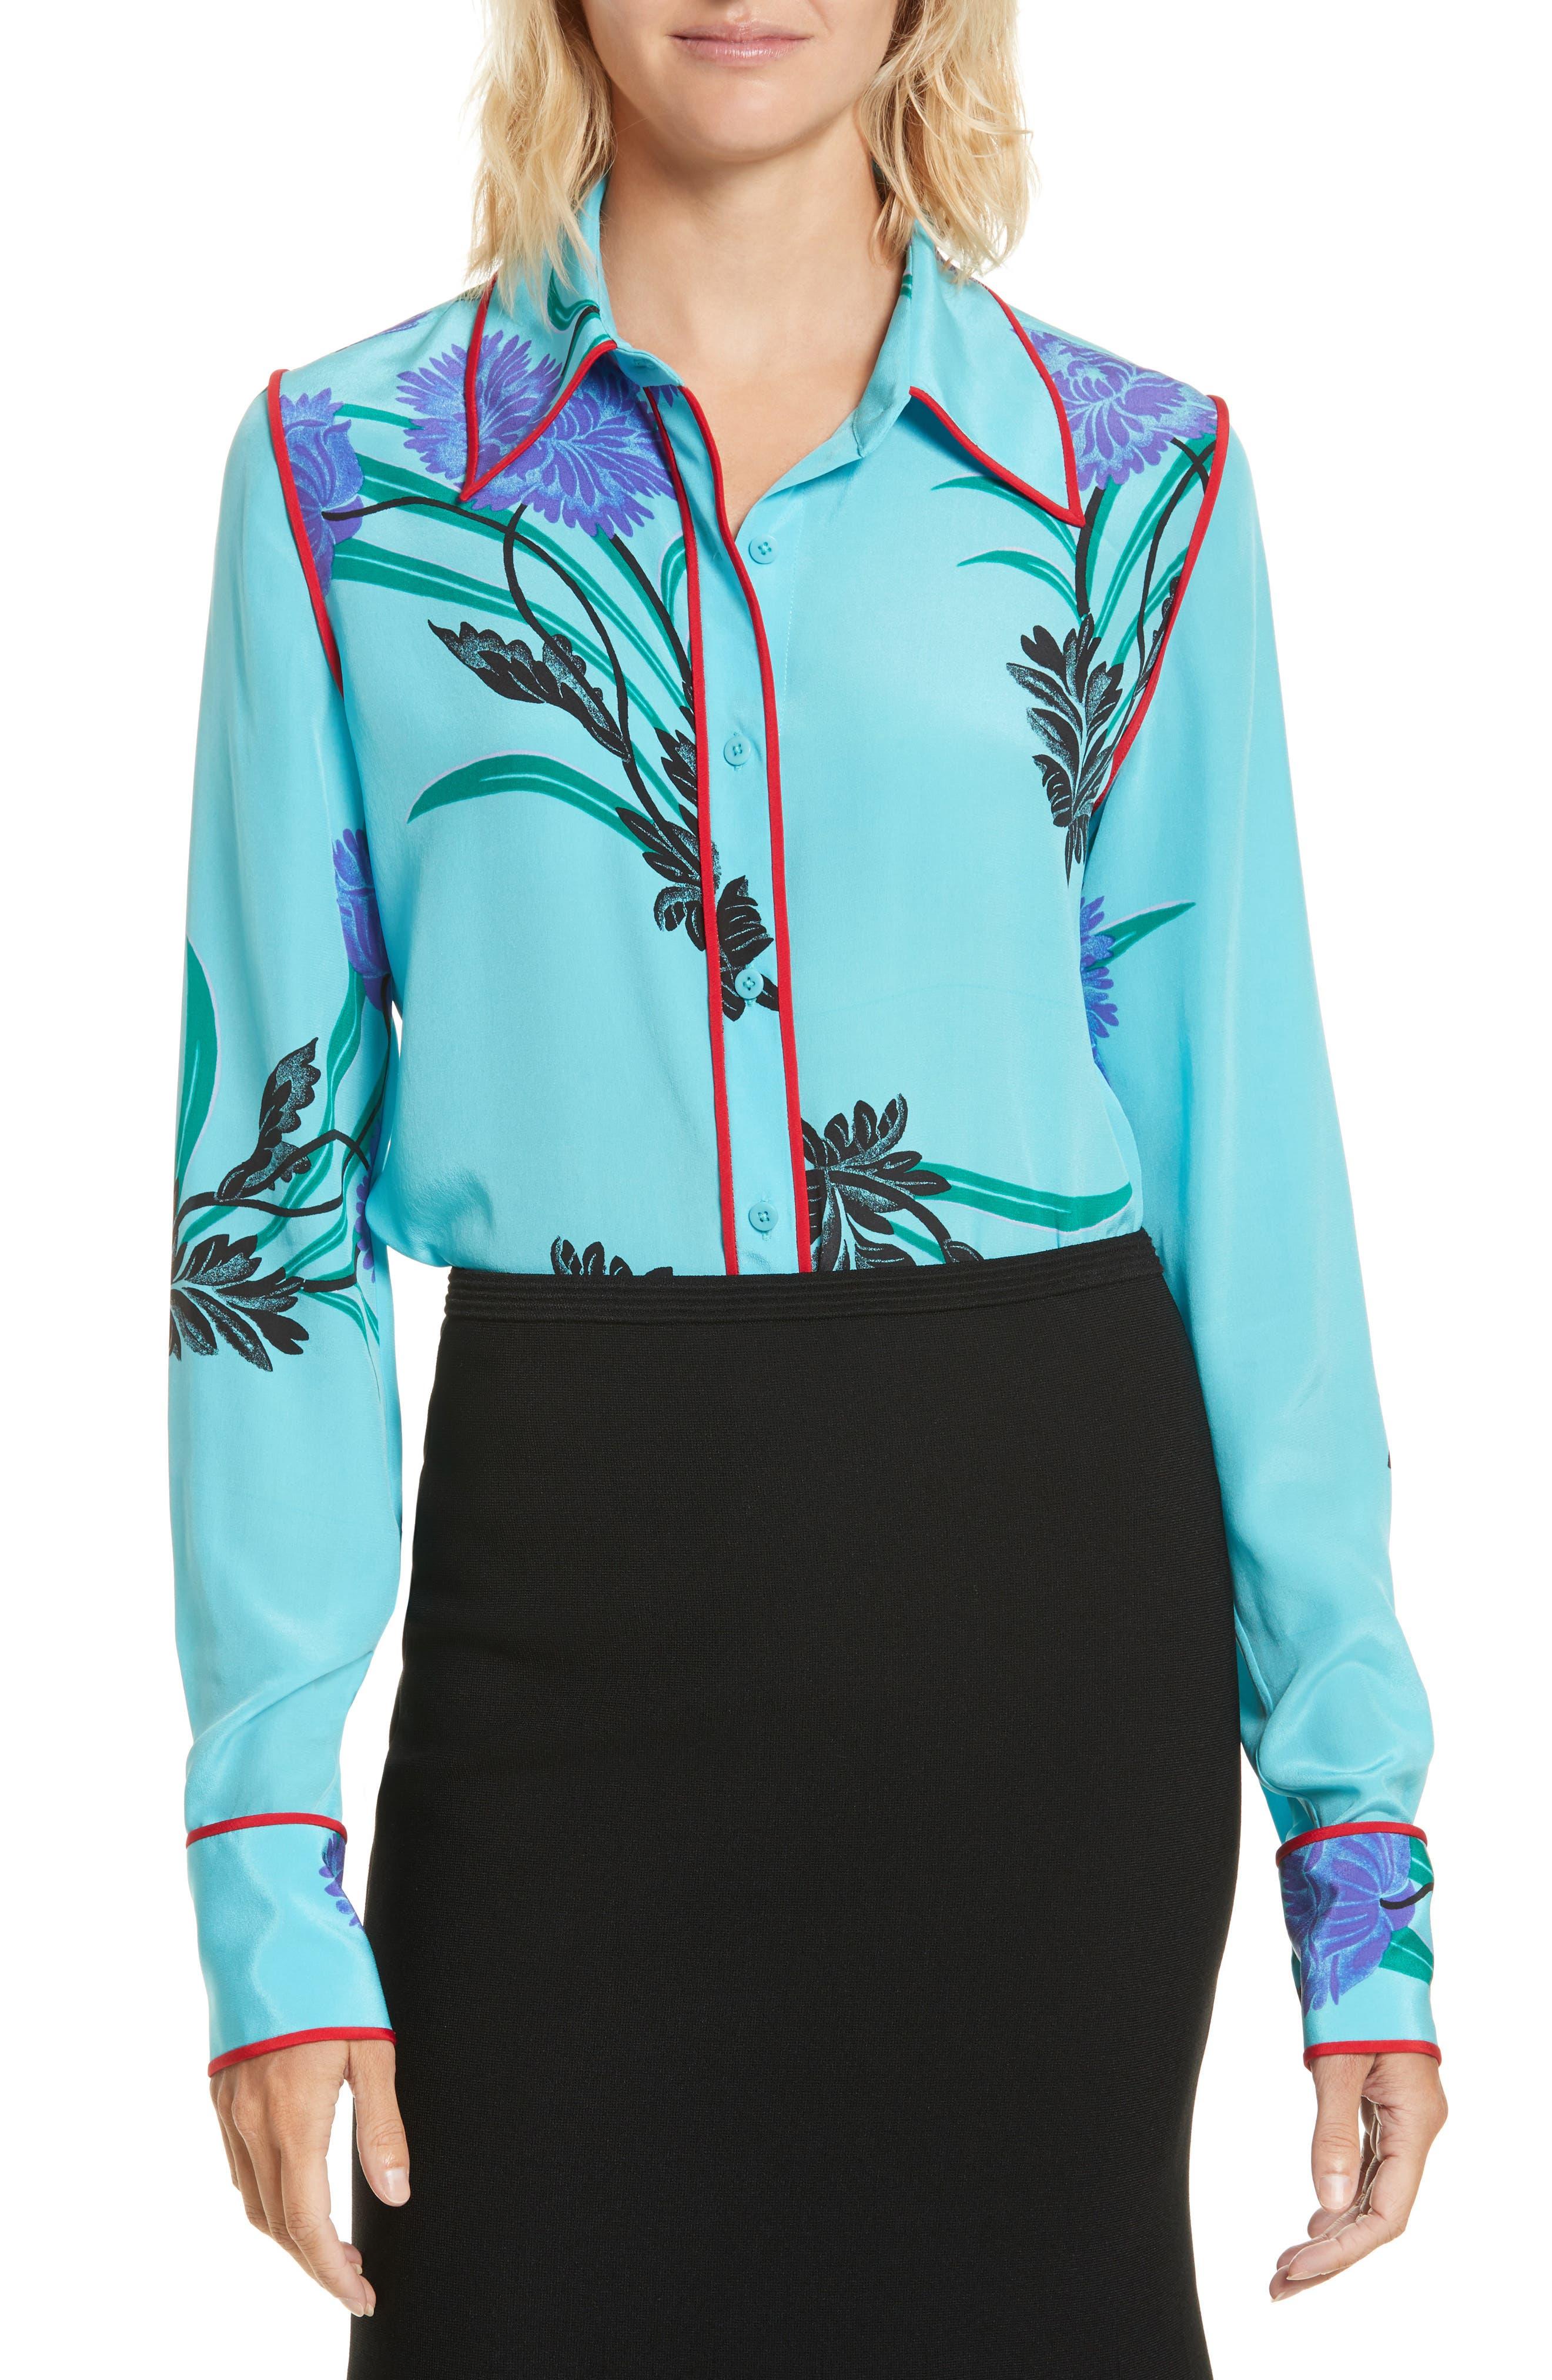 Alternate Image 1 Selected - Diane von Furstenberg Floral Print Stretch Silk Shirt